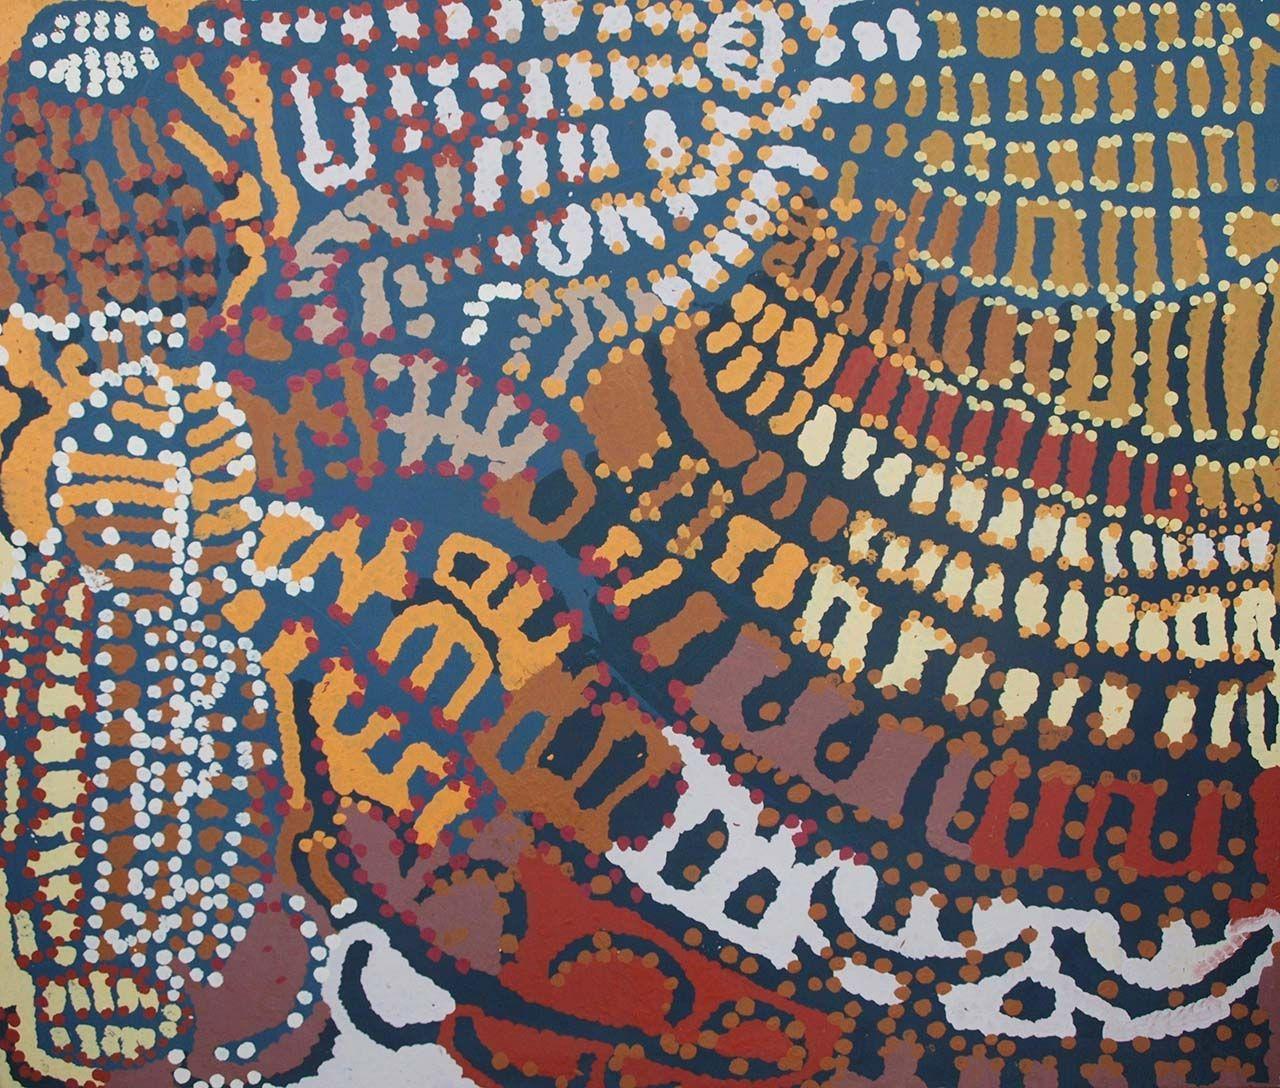 Yarla Jukurrpa – Bush Yam Dreaming by Lorna Napurrula Fencer